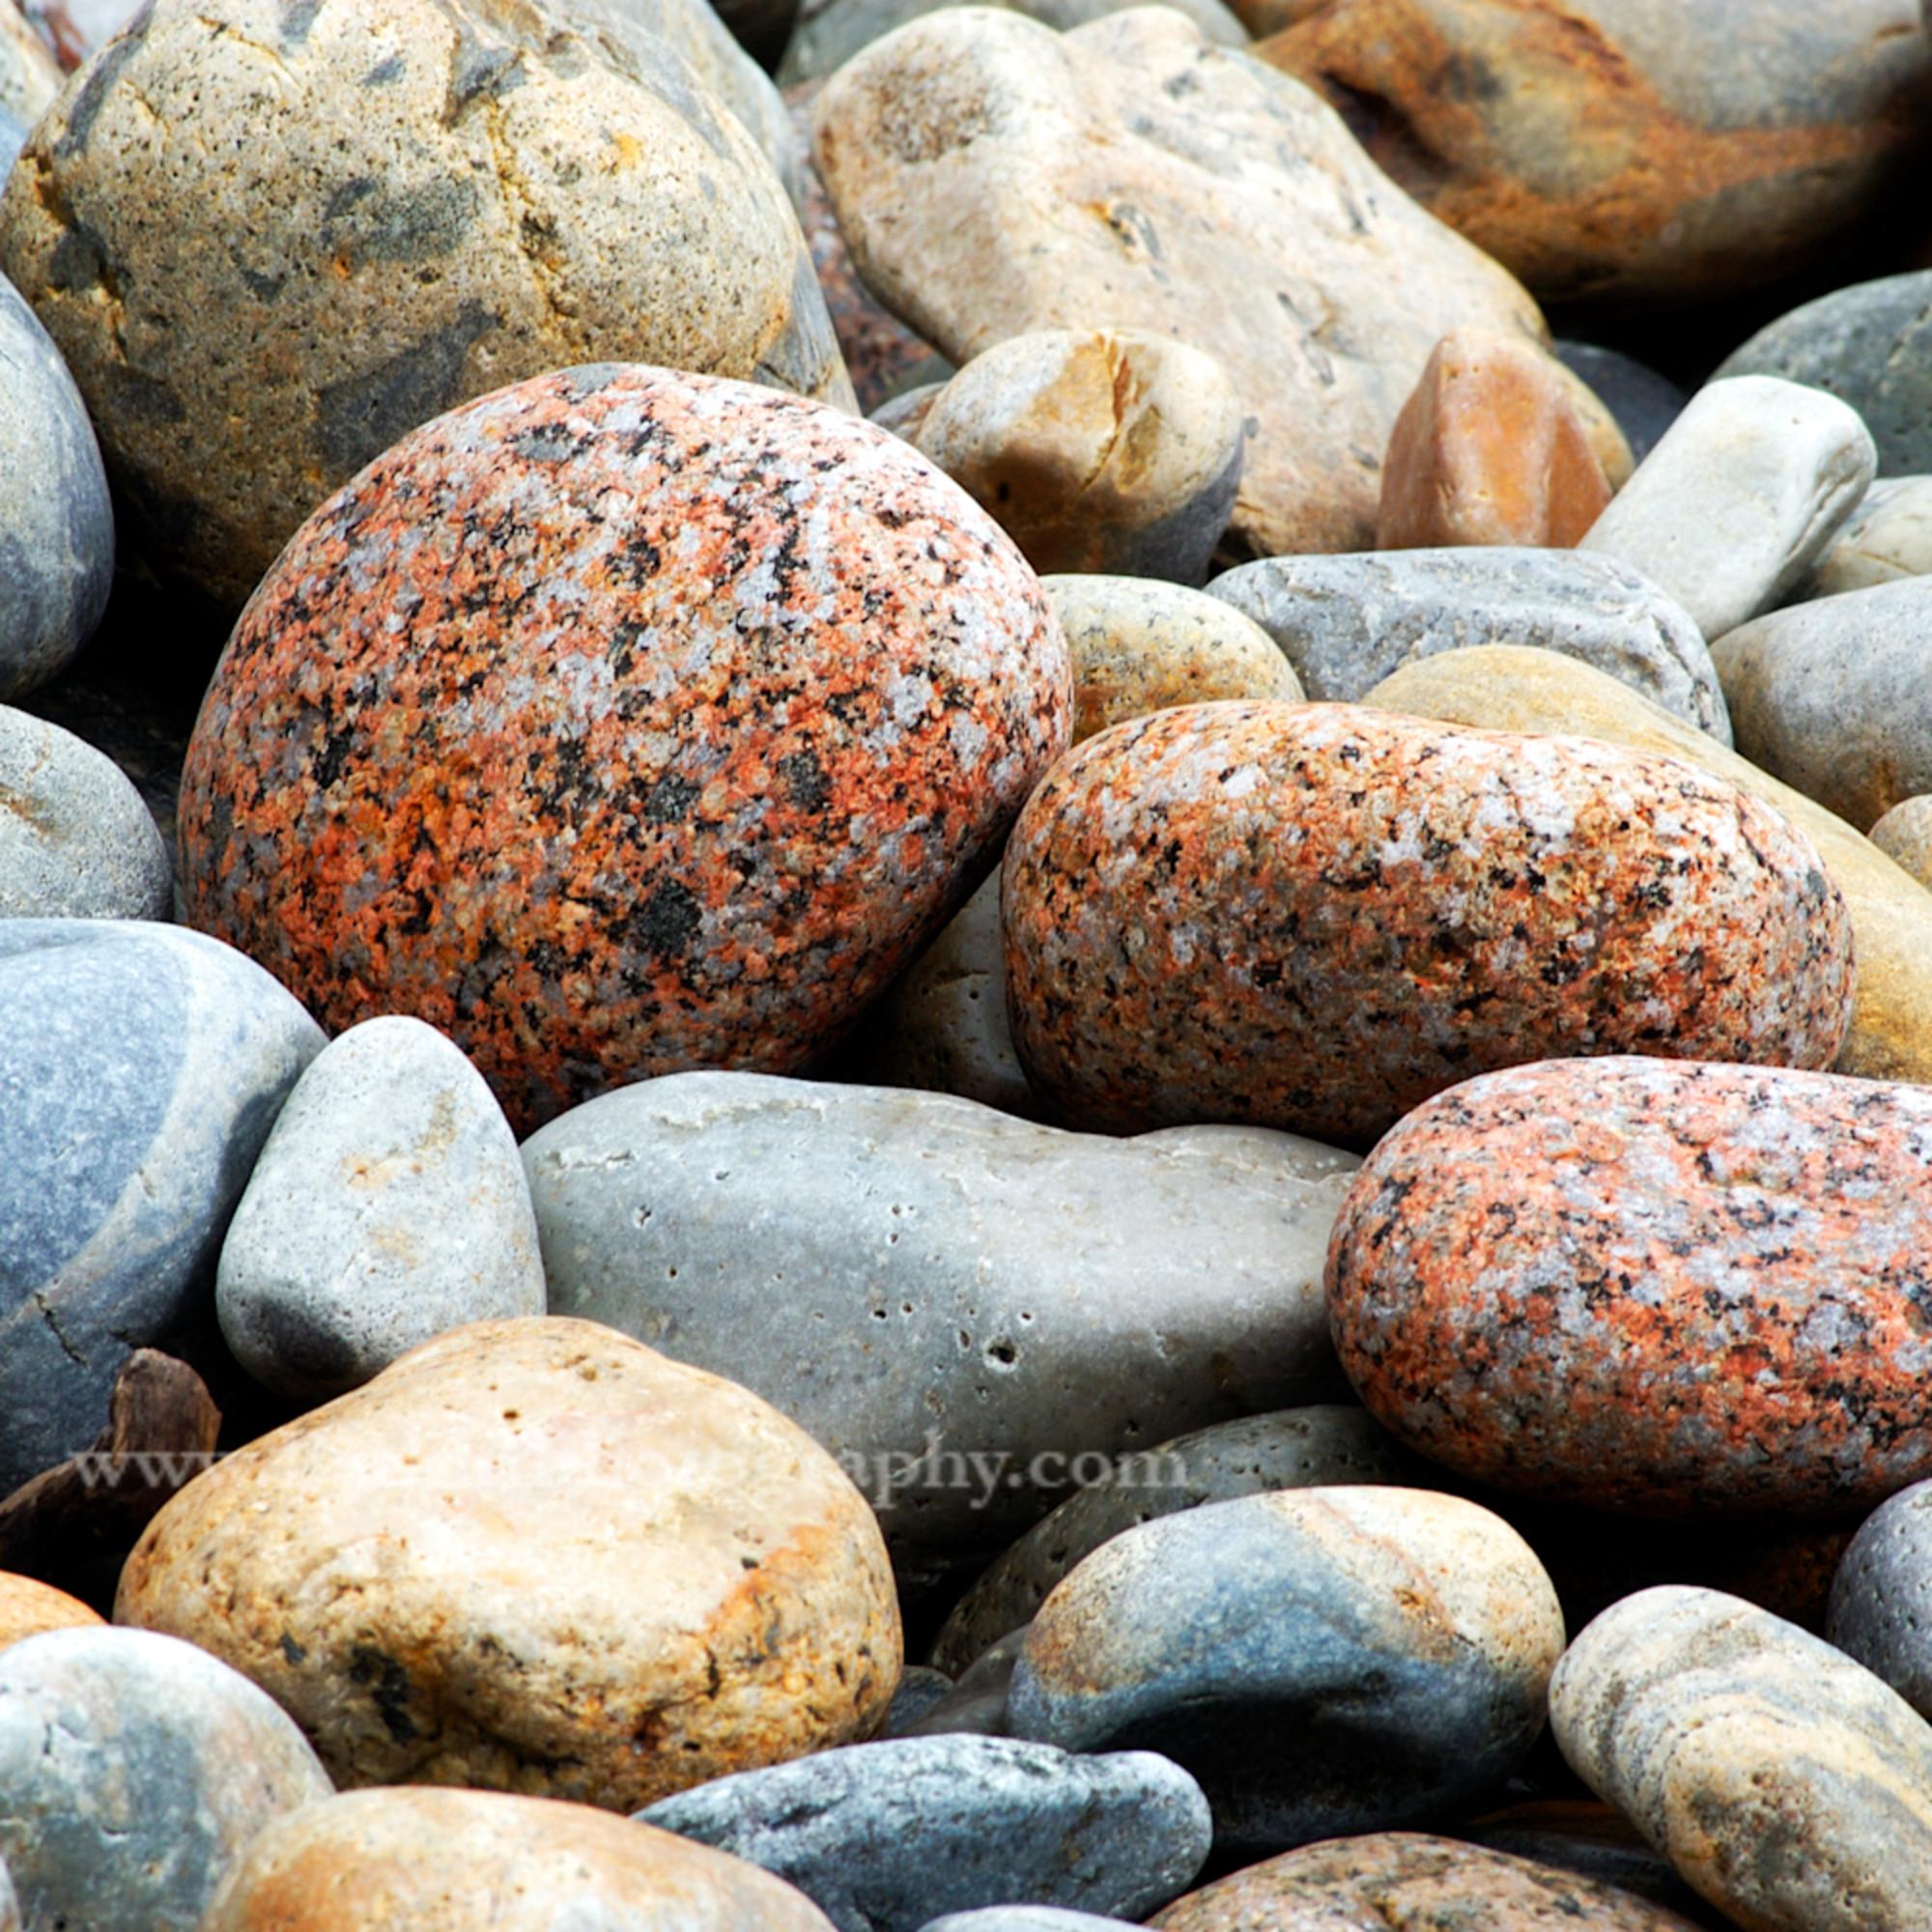 Shore rocks 113 asf l9ad32